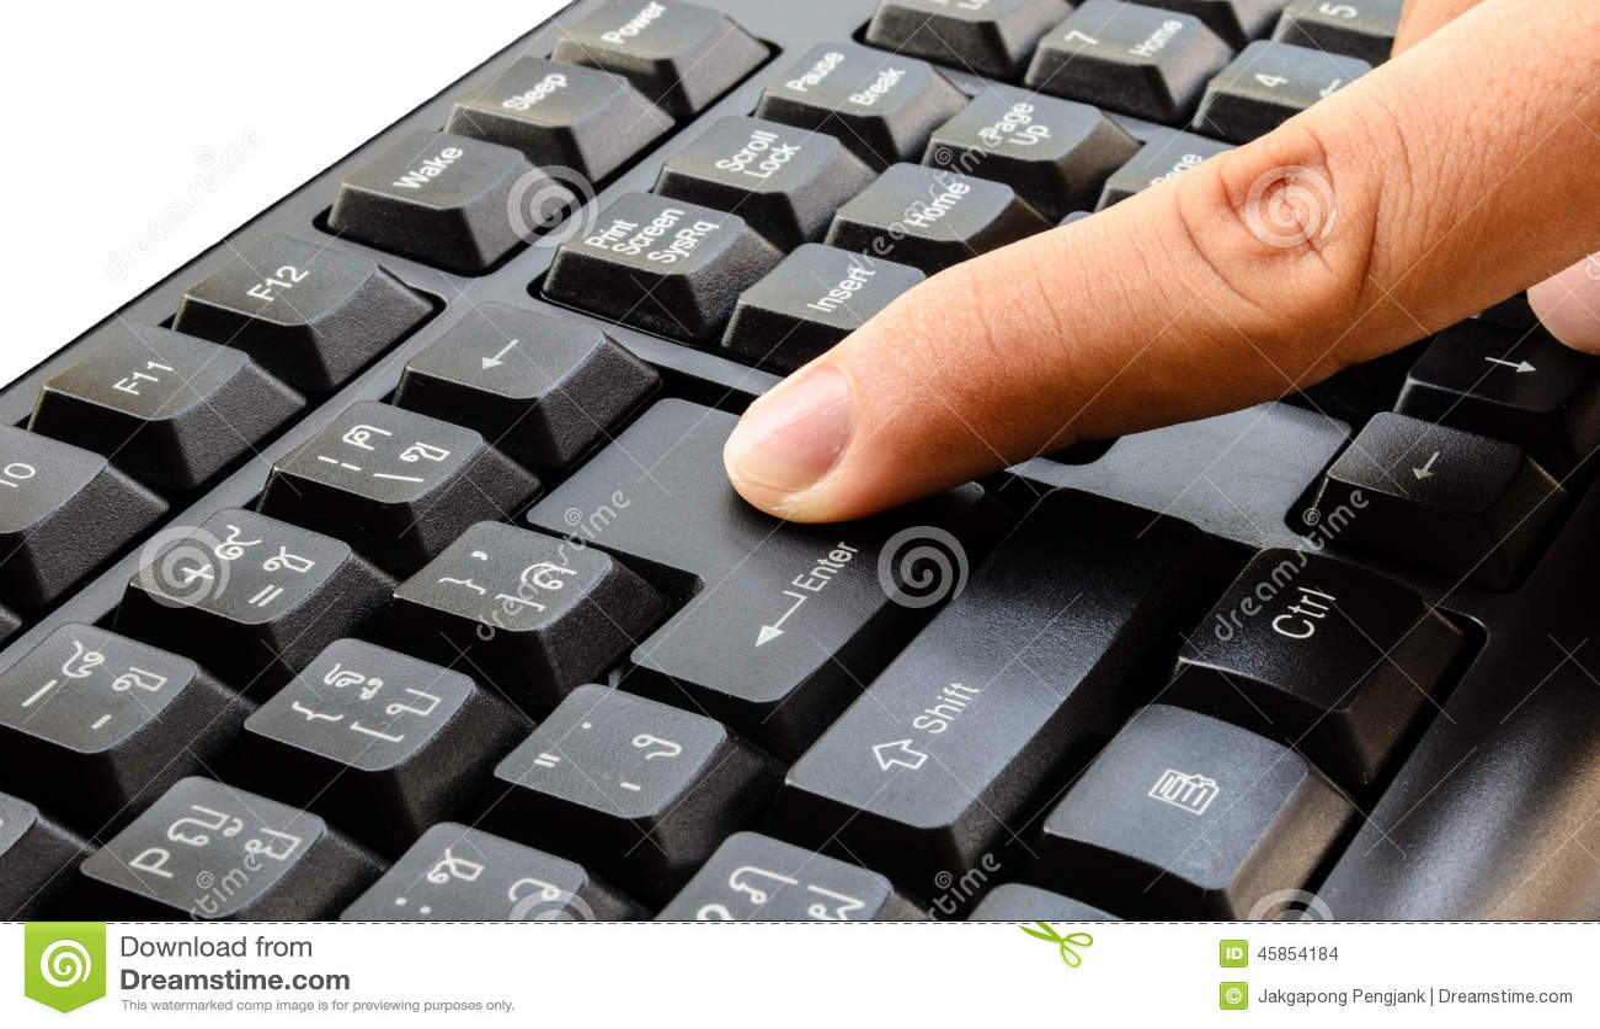 Push keyboard